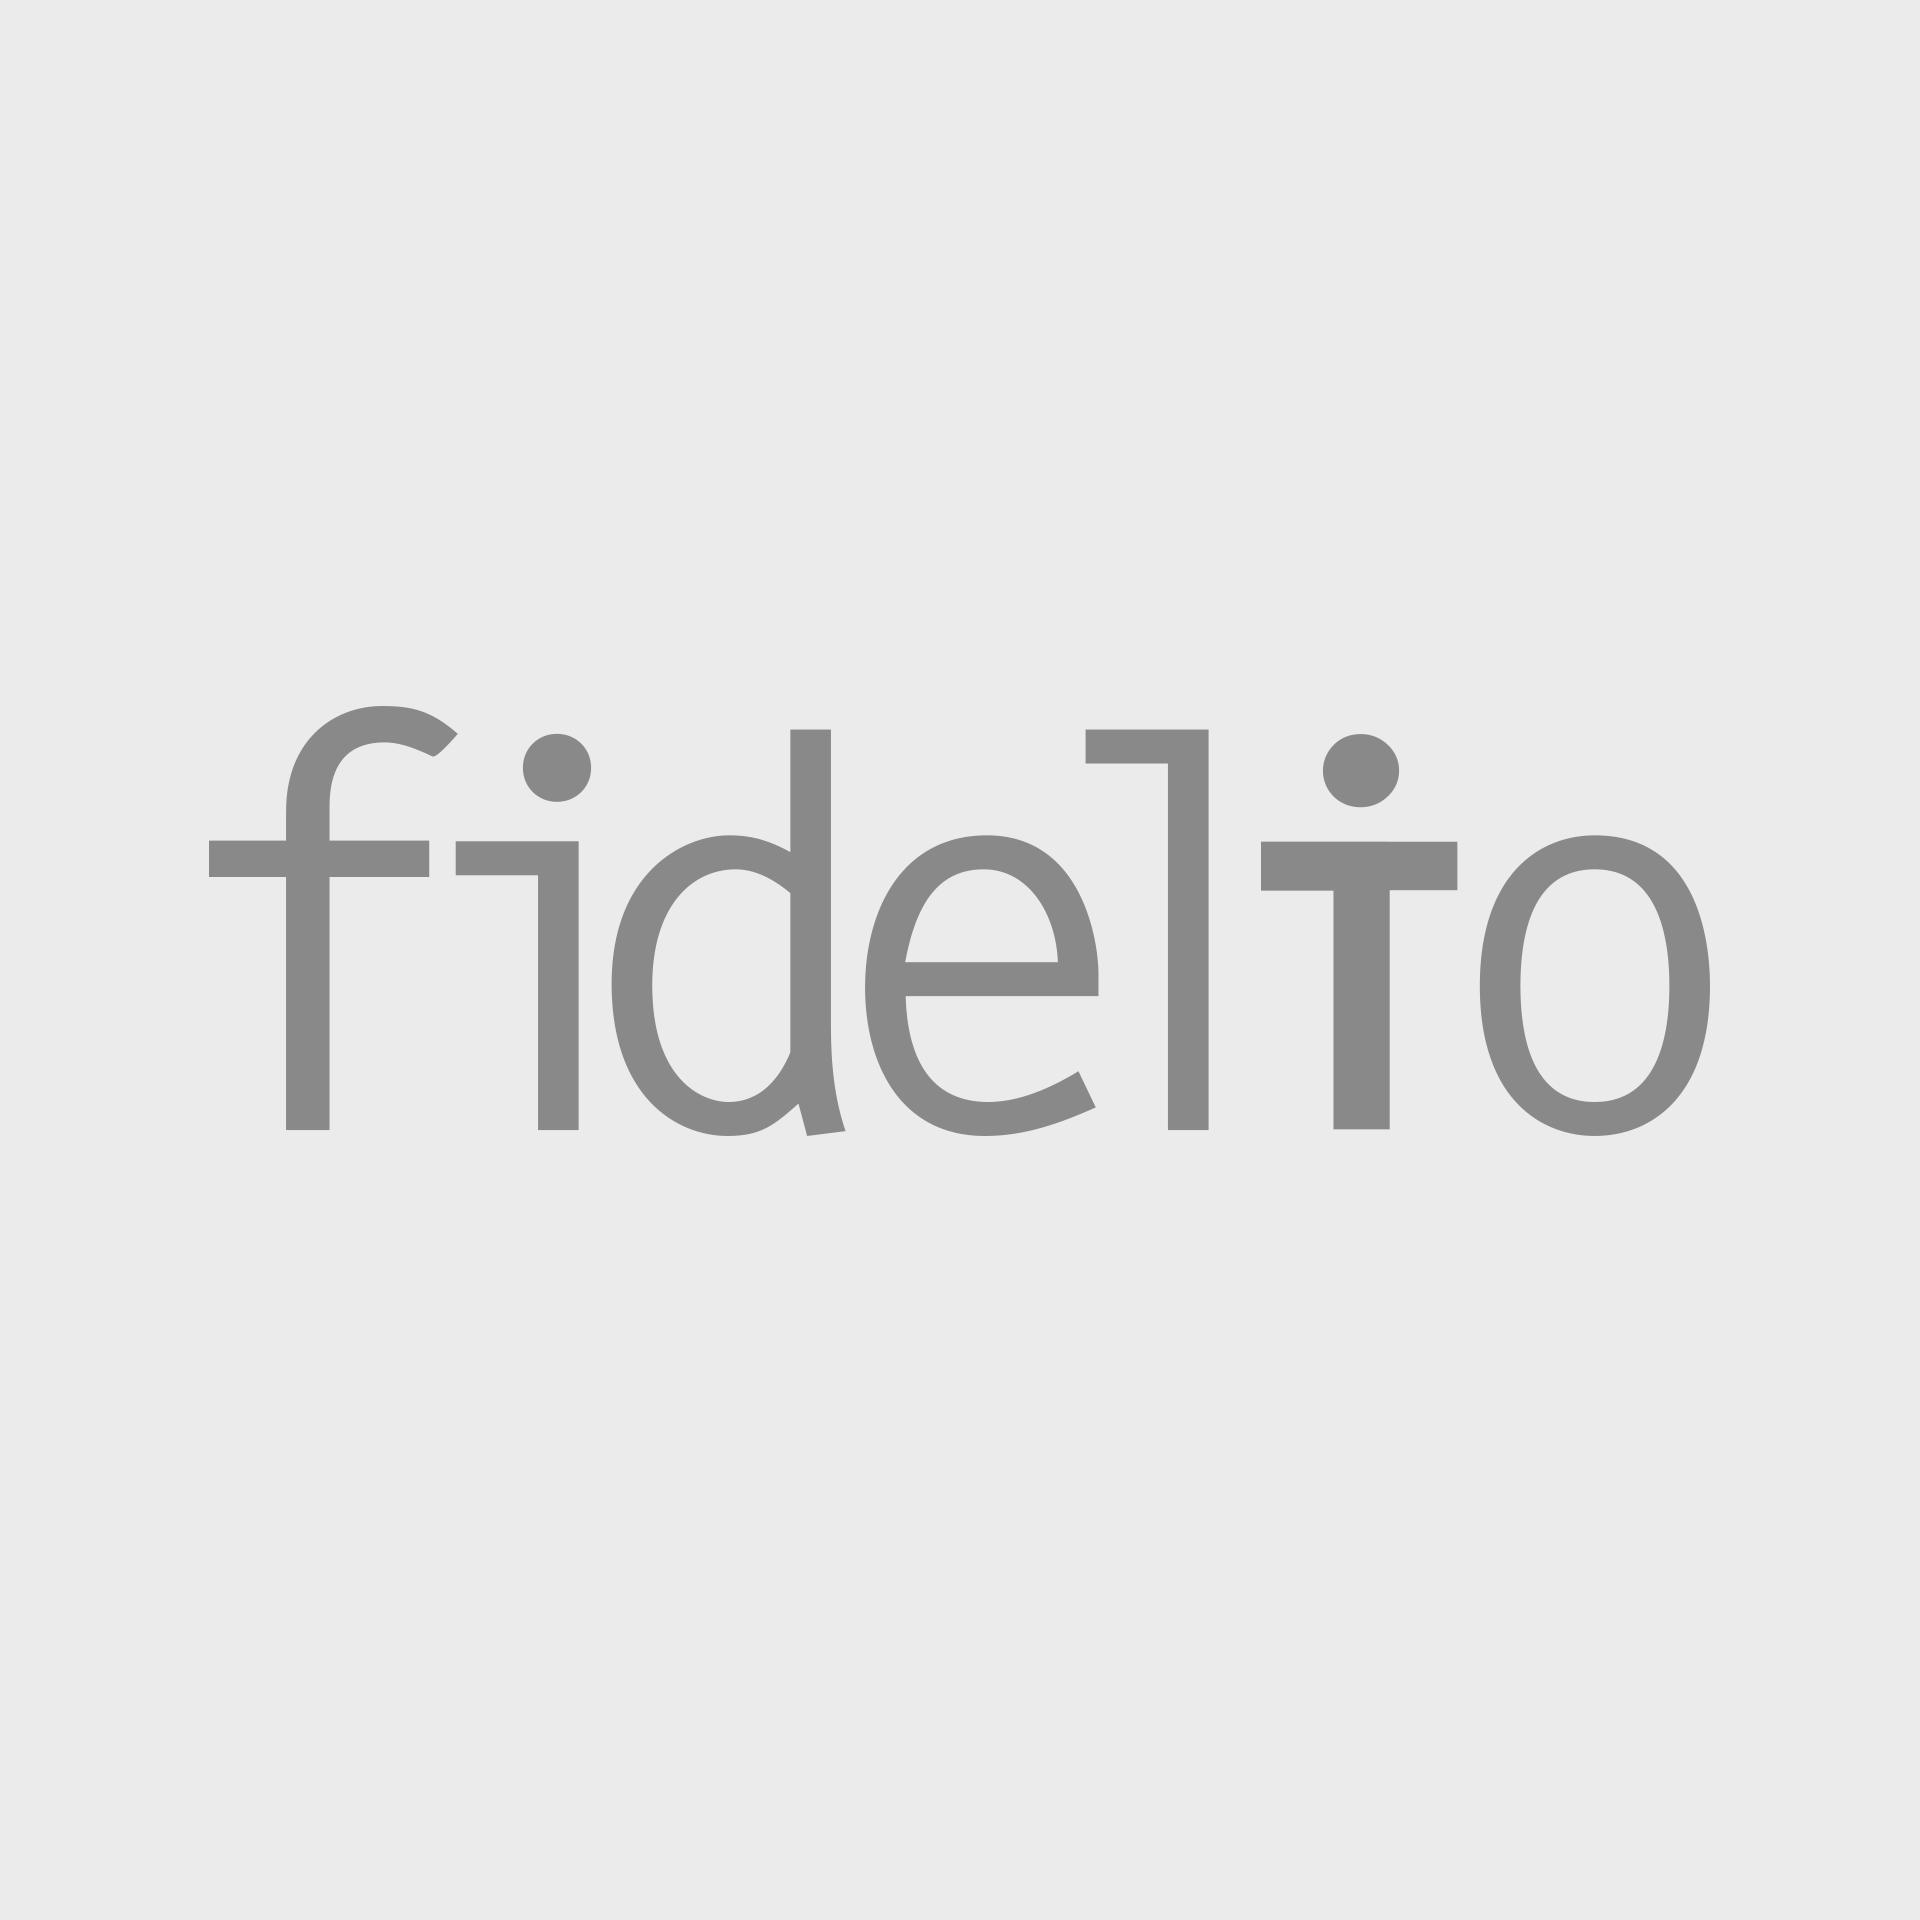 szkb-credo-koncepciofotok-9753_vizjeles-114816.jpg